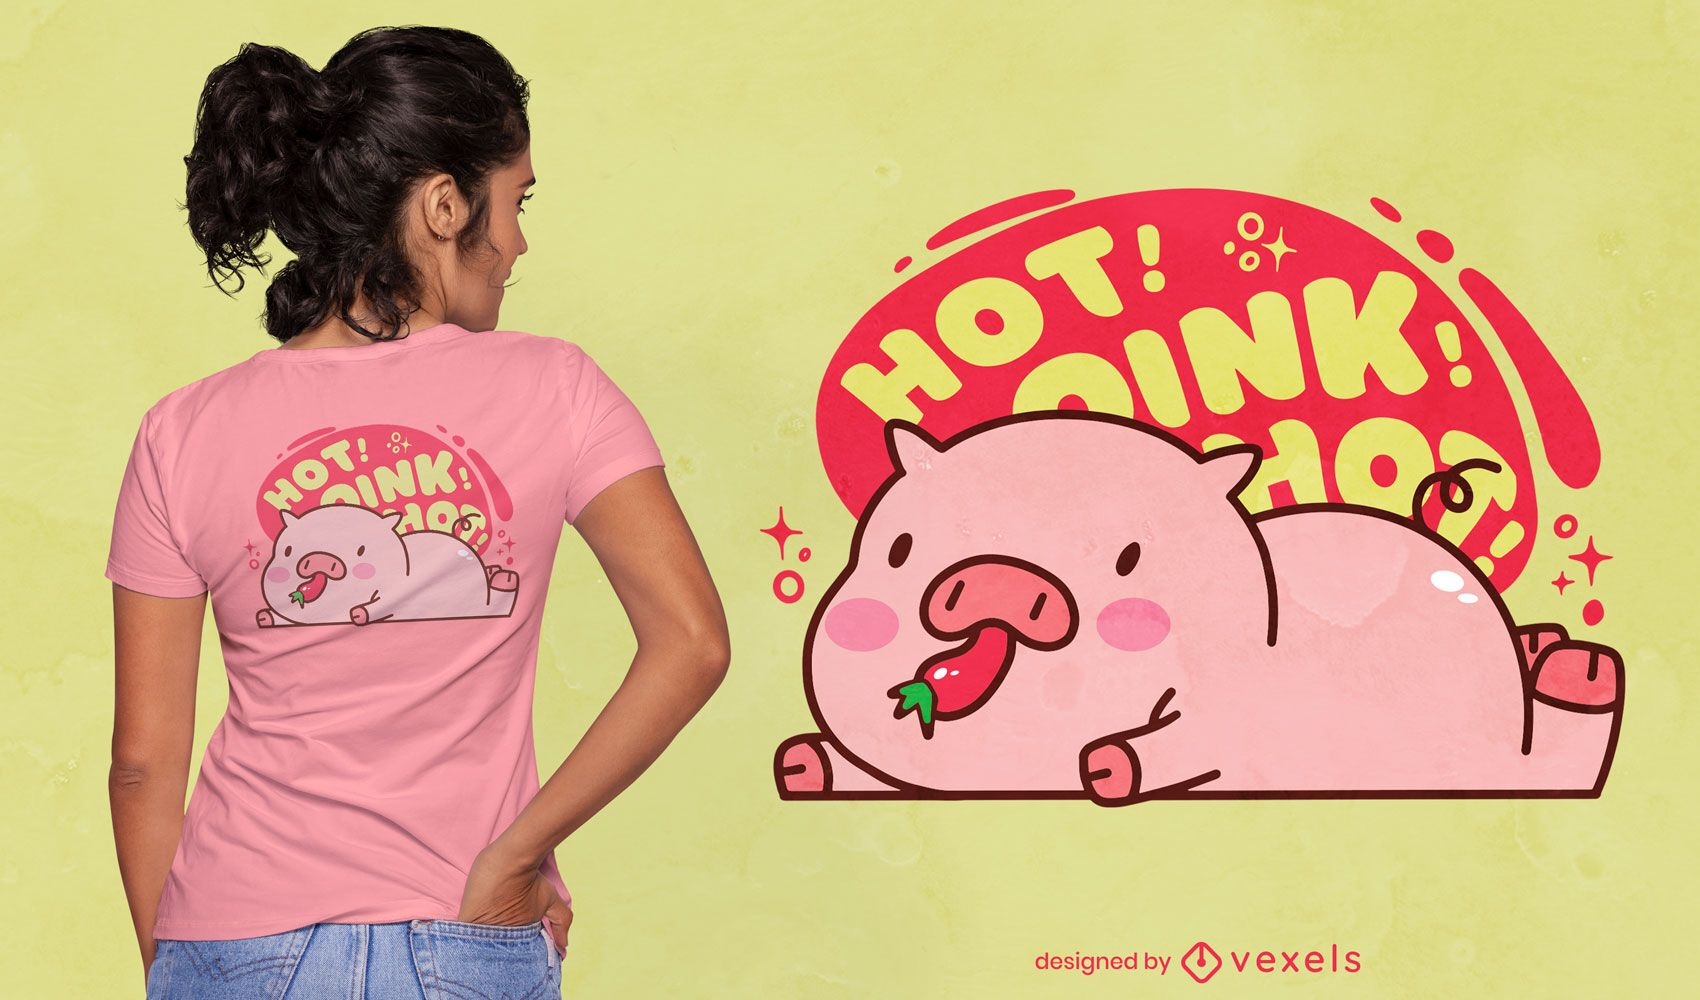 Animal de porco comendo pimenta design de camiseta fofa